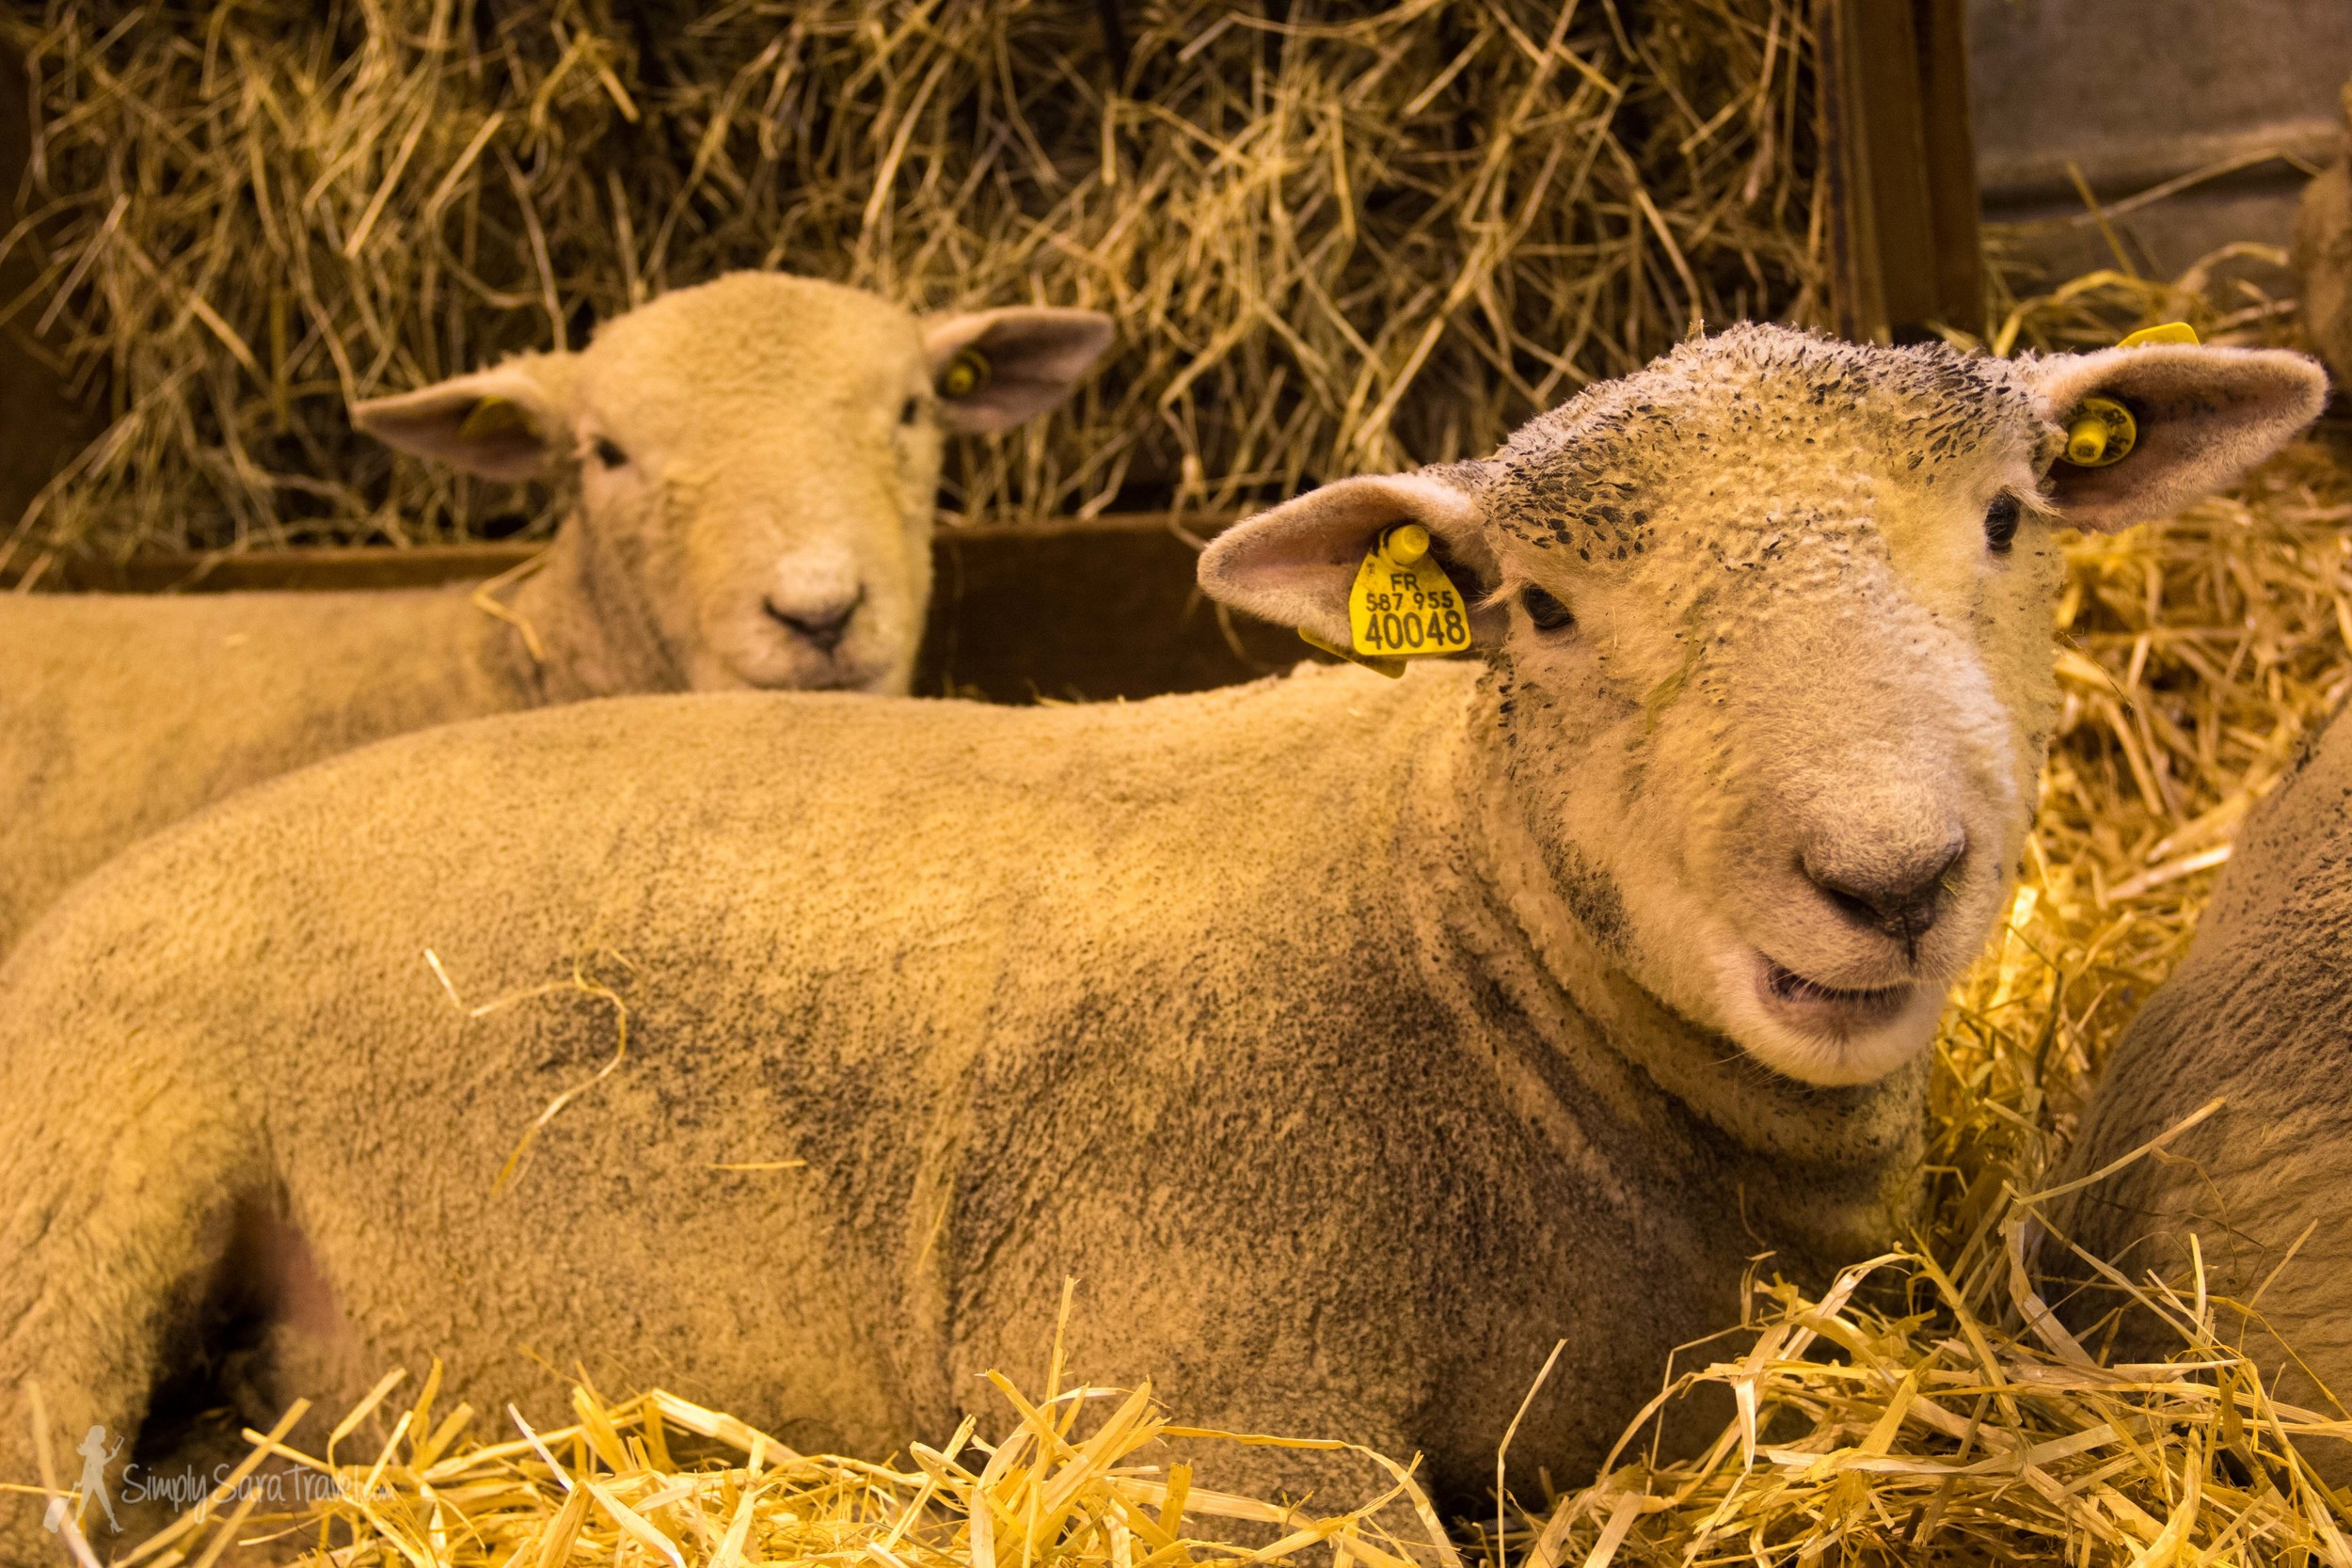 Two sheep Salon International de l'Agriculture (International Agricultural Show) Paris France